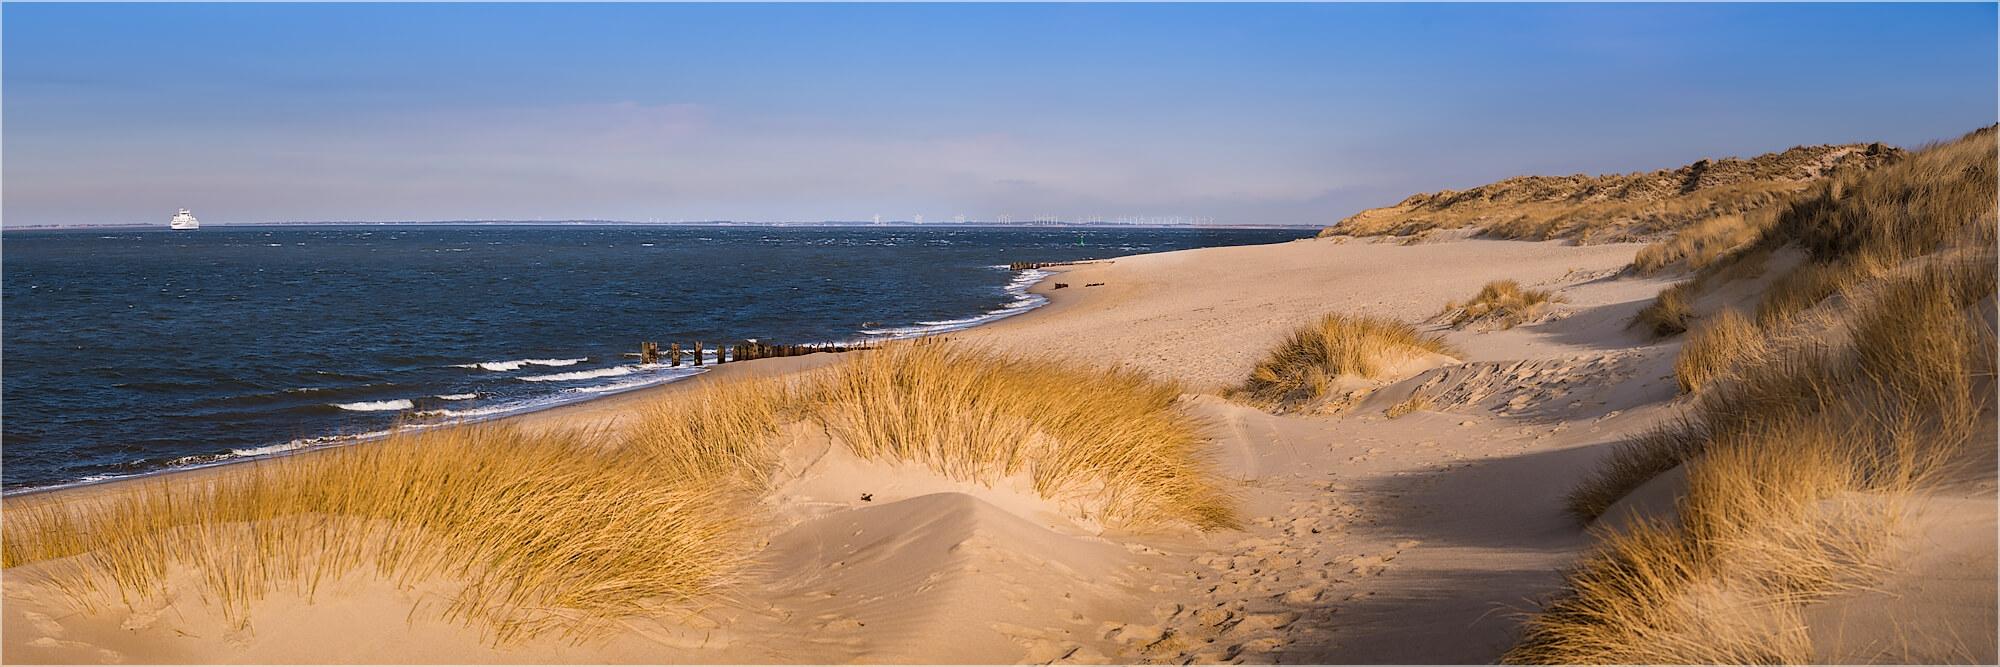 Panoramabild Dünen der Nordsee auf Sylt